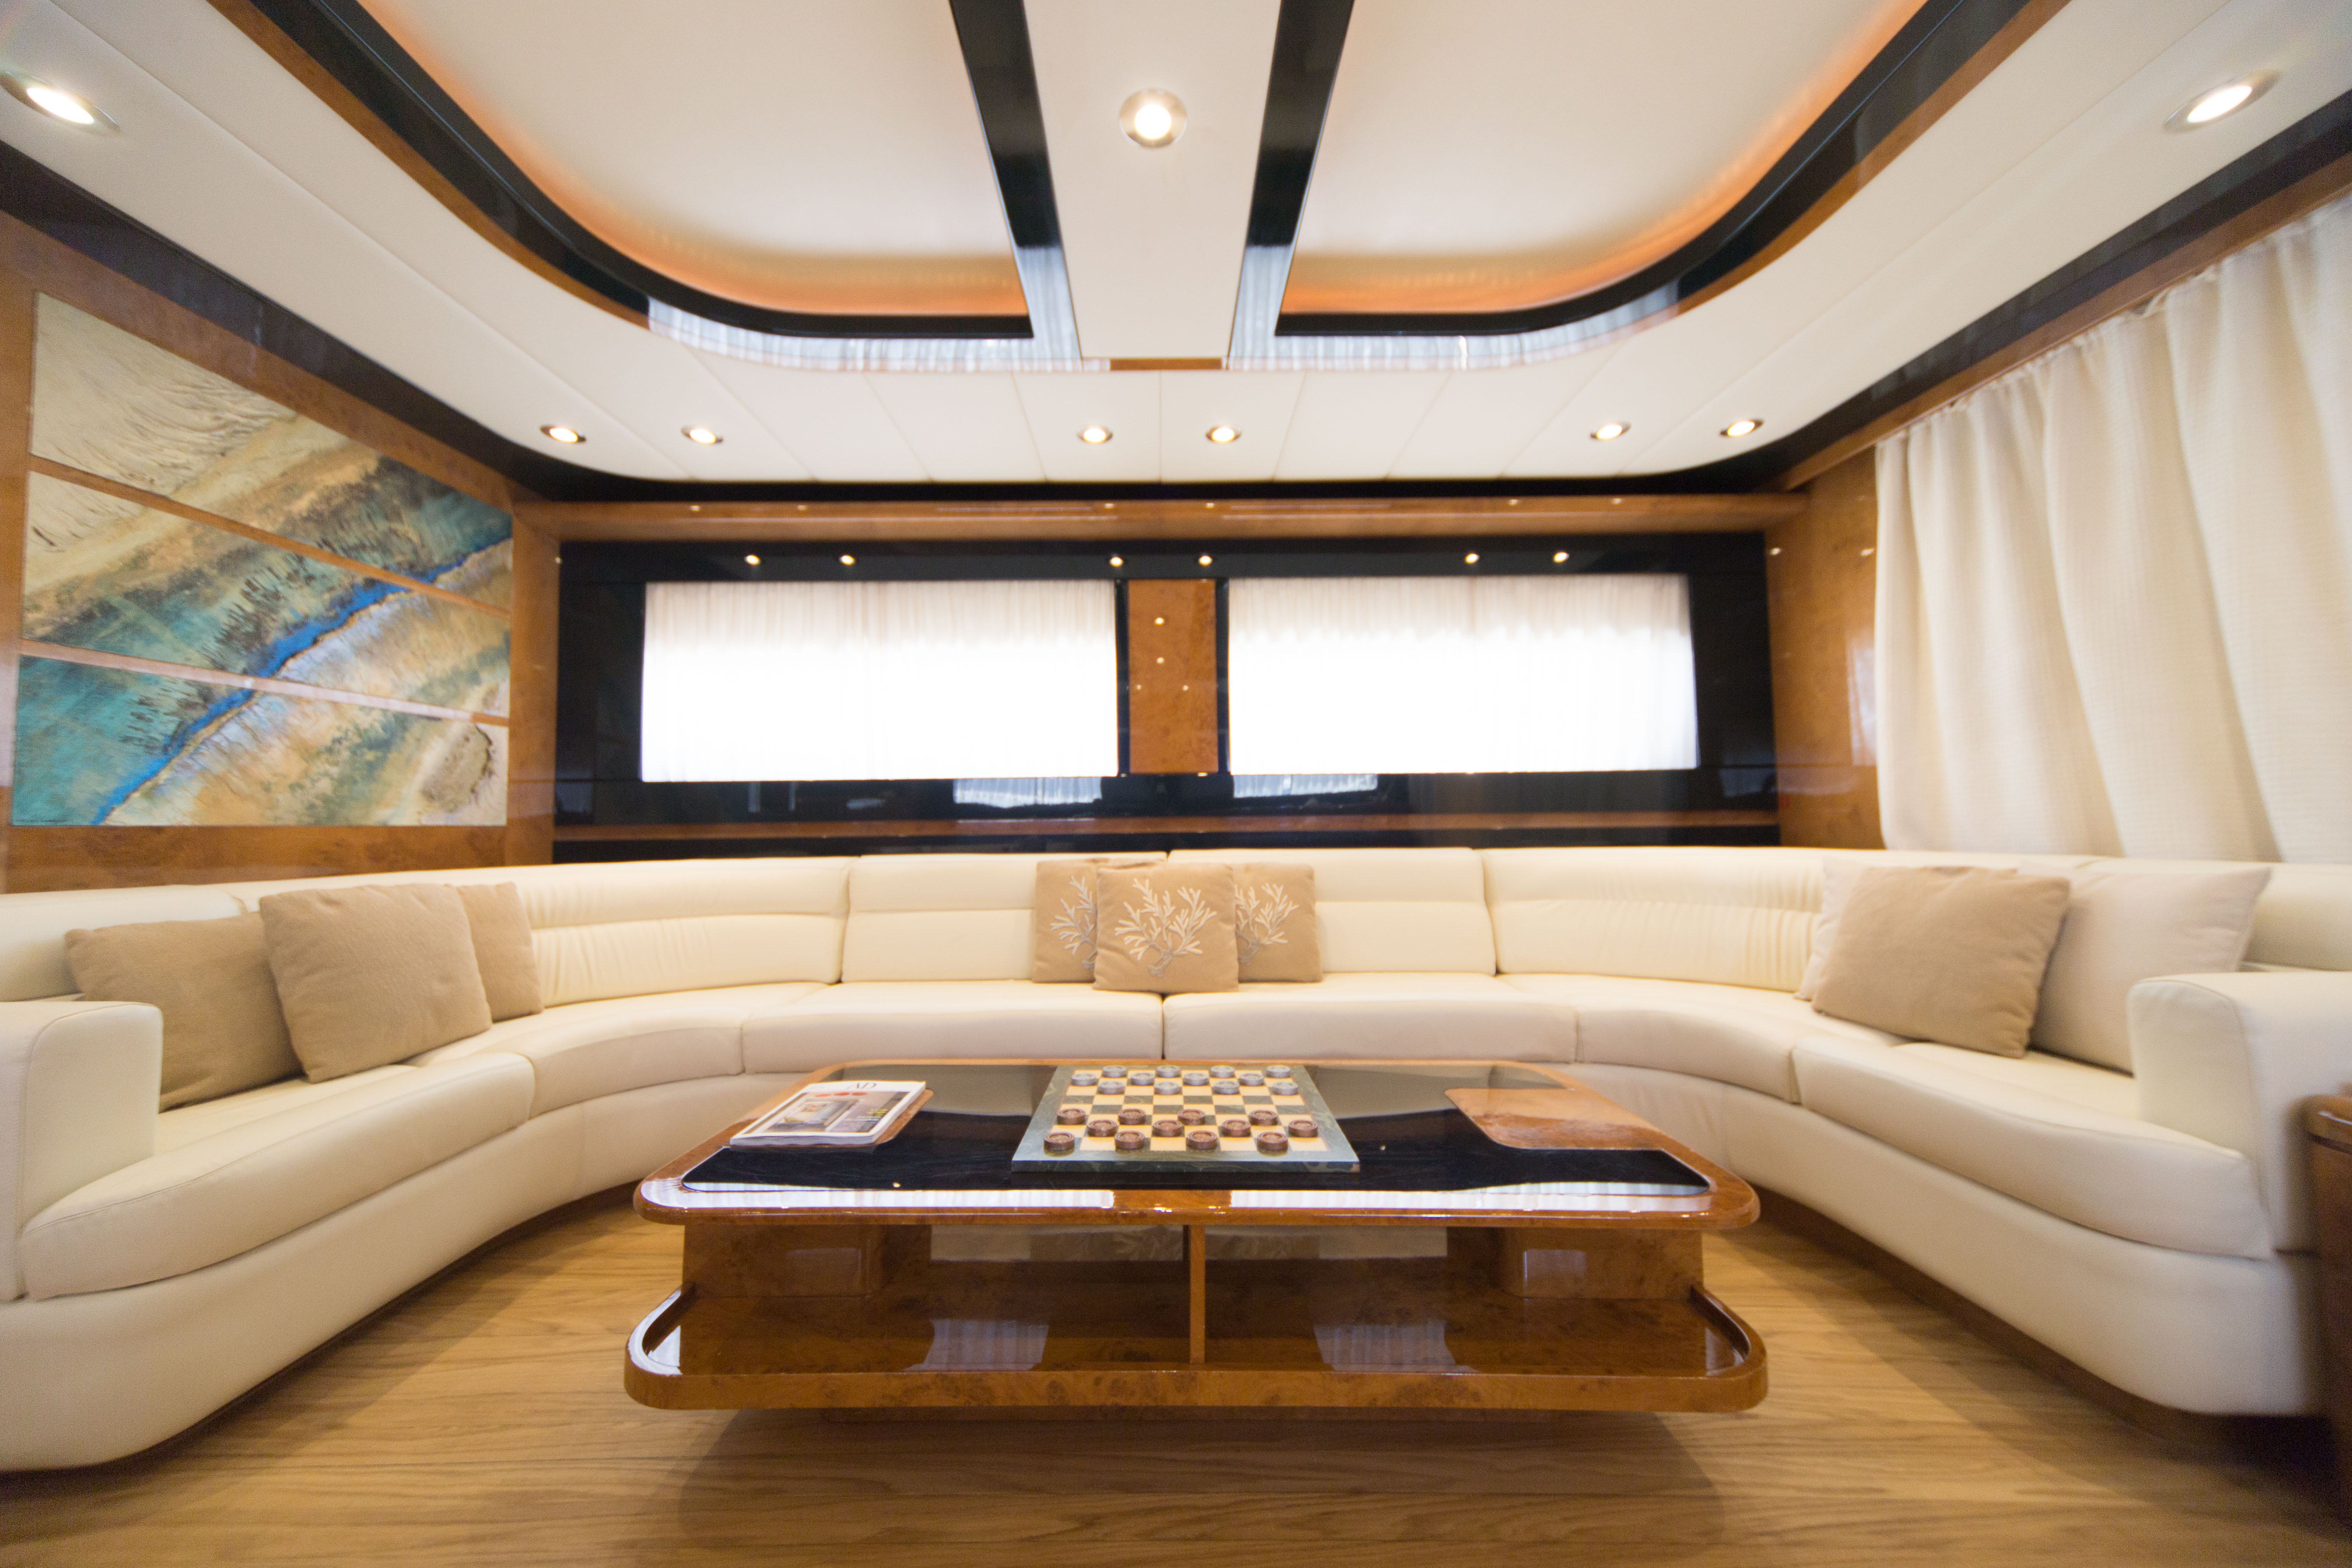 Phenomenal Zia Canaia Riva Opera 80 S Levante Yachts Home Remodeling Inspirations Cosmcuboardxyz